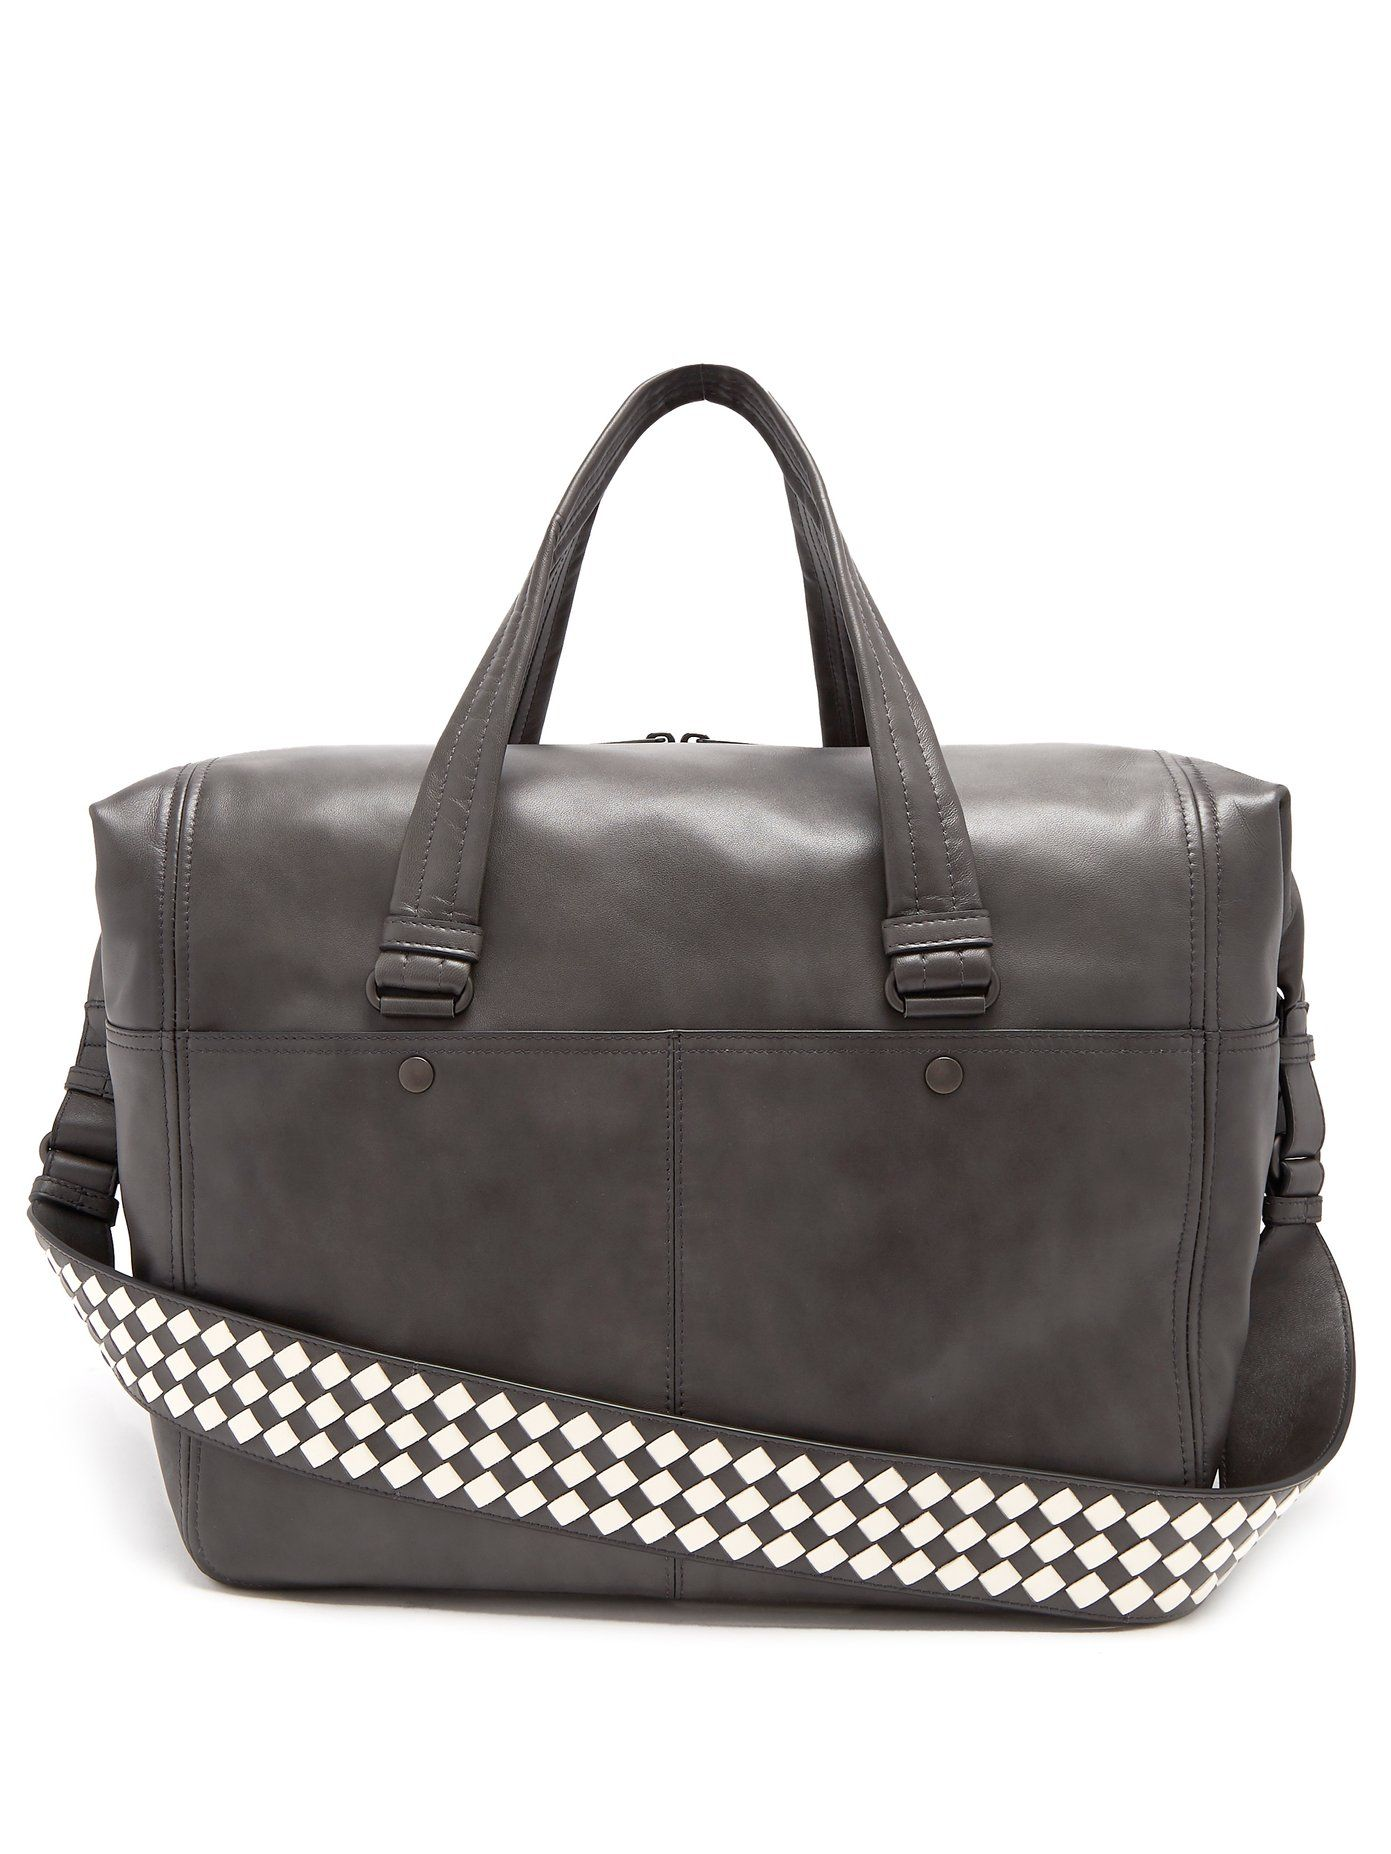 Bottega Veneta Intrecciato-strap leather holdall  8acf22f8d7628